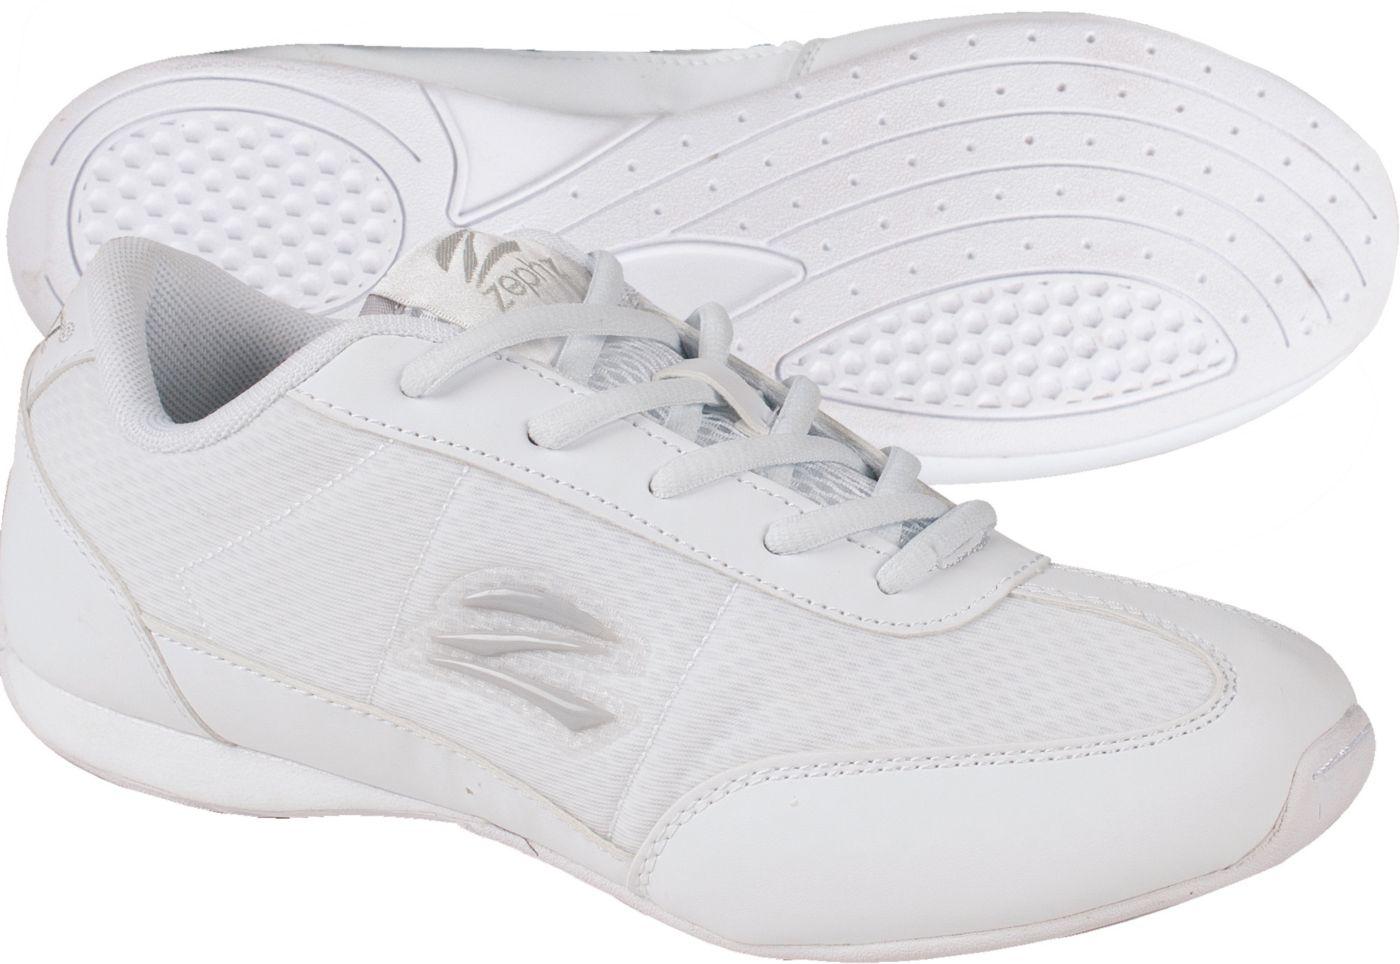 zephz Kids' Butterfly Lite Cheerleading Shoes